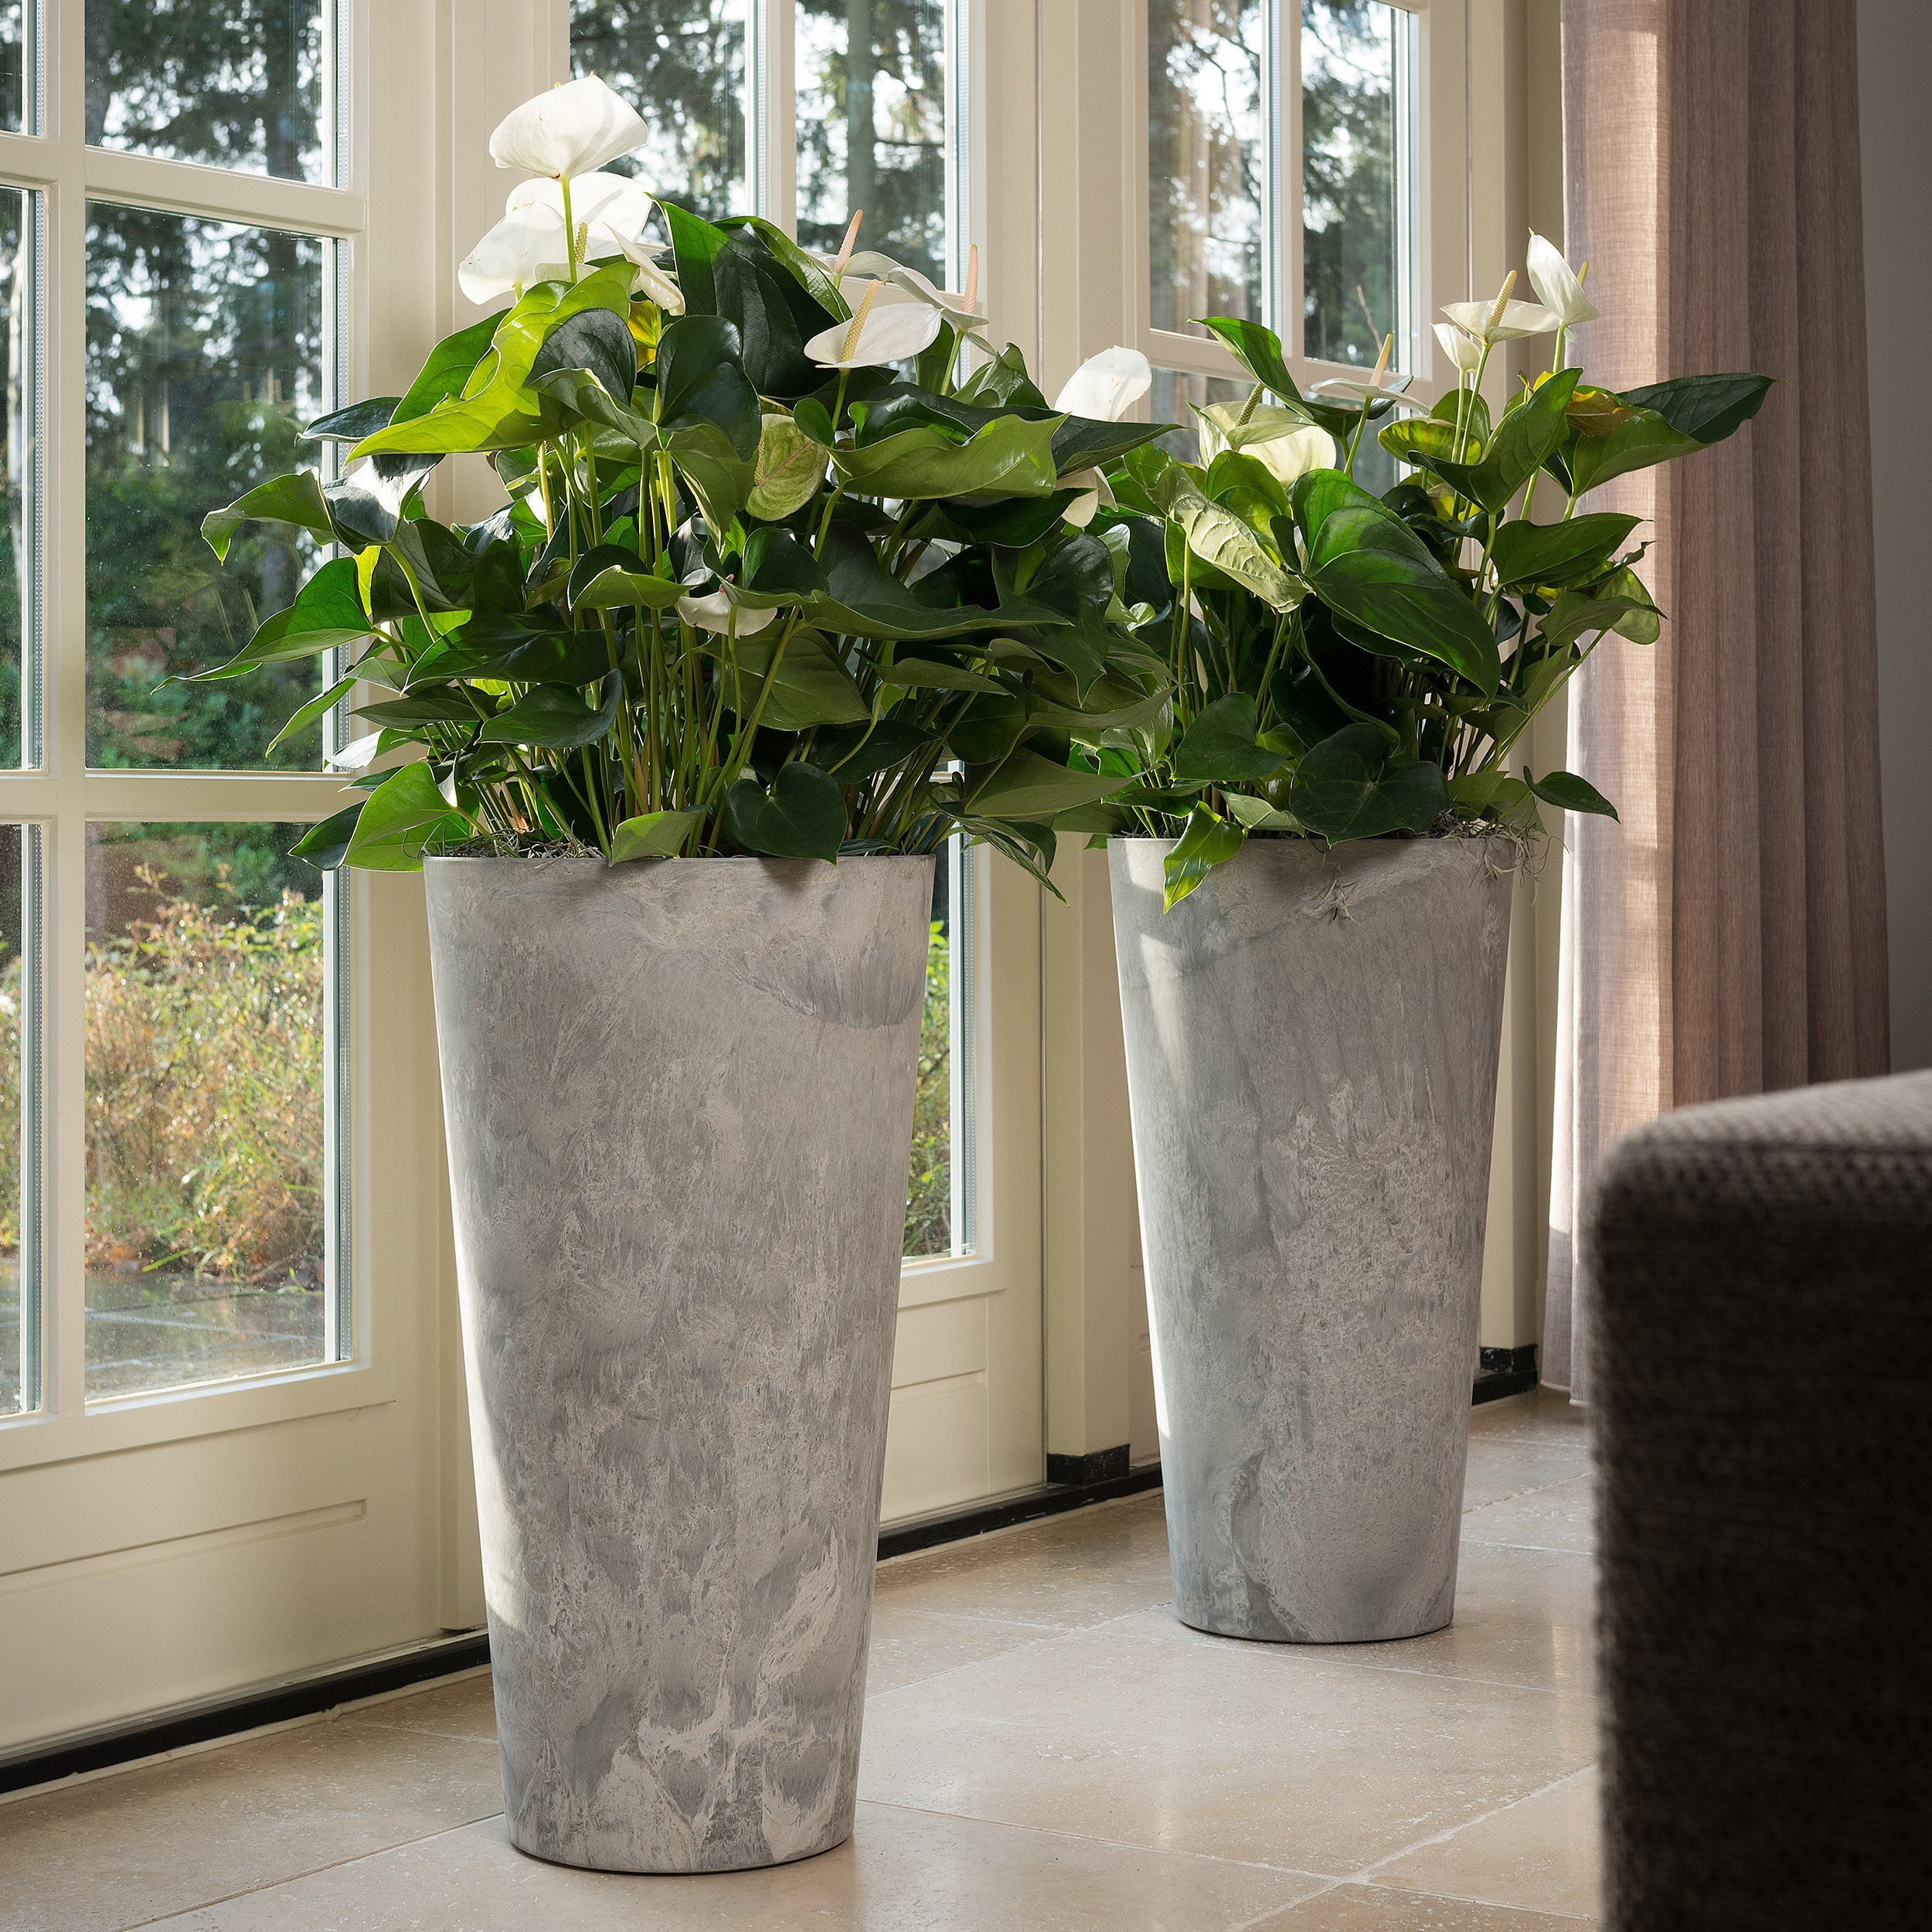 pflanzs ule claire h70cm farbe grau h he 70 cm. Black Bedroom Furniture Sets. Home Design Ideas